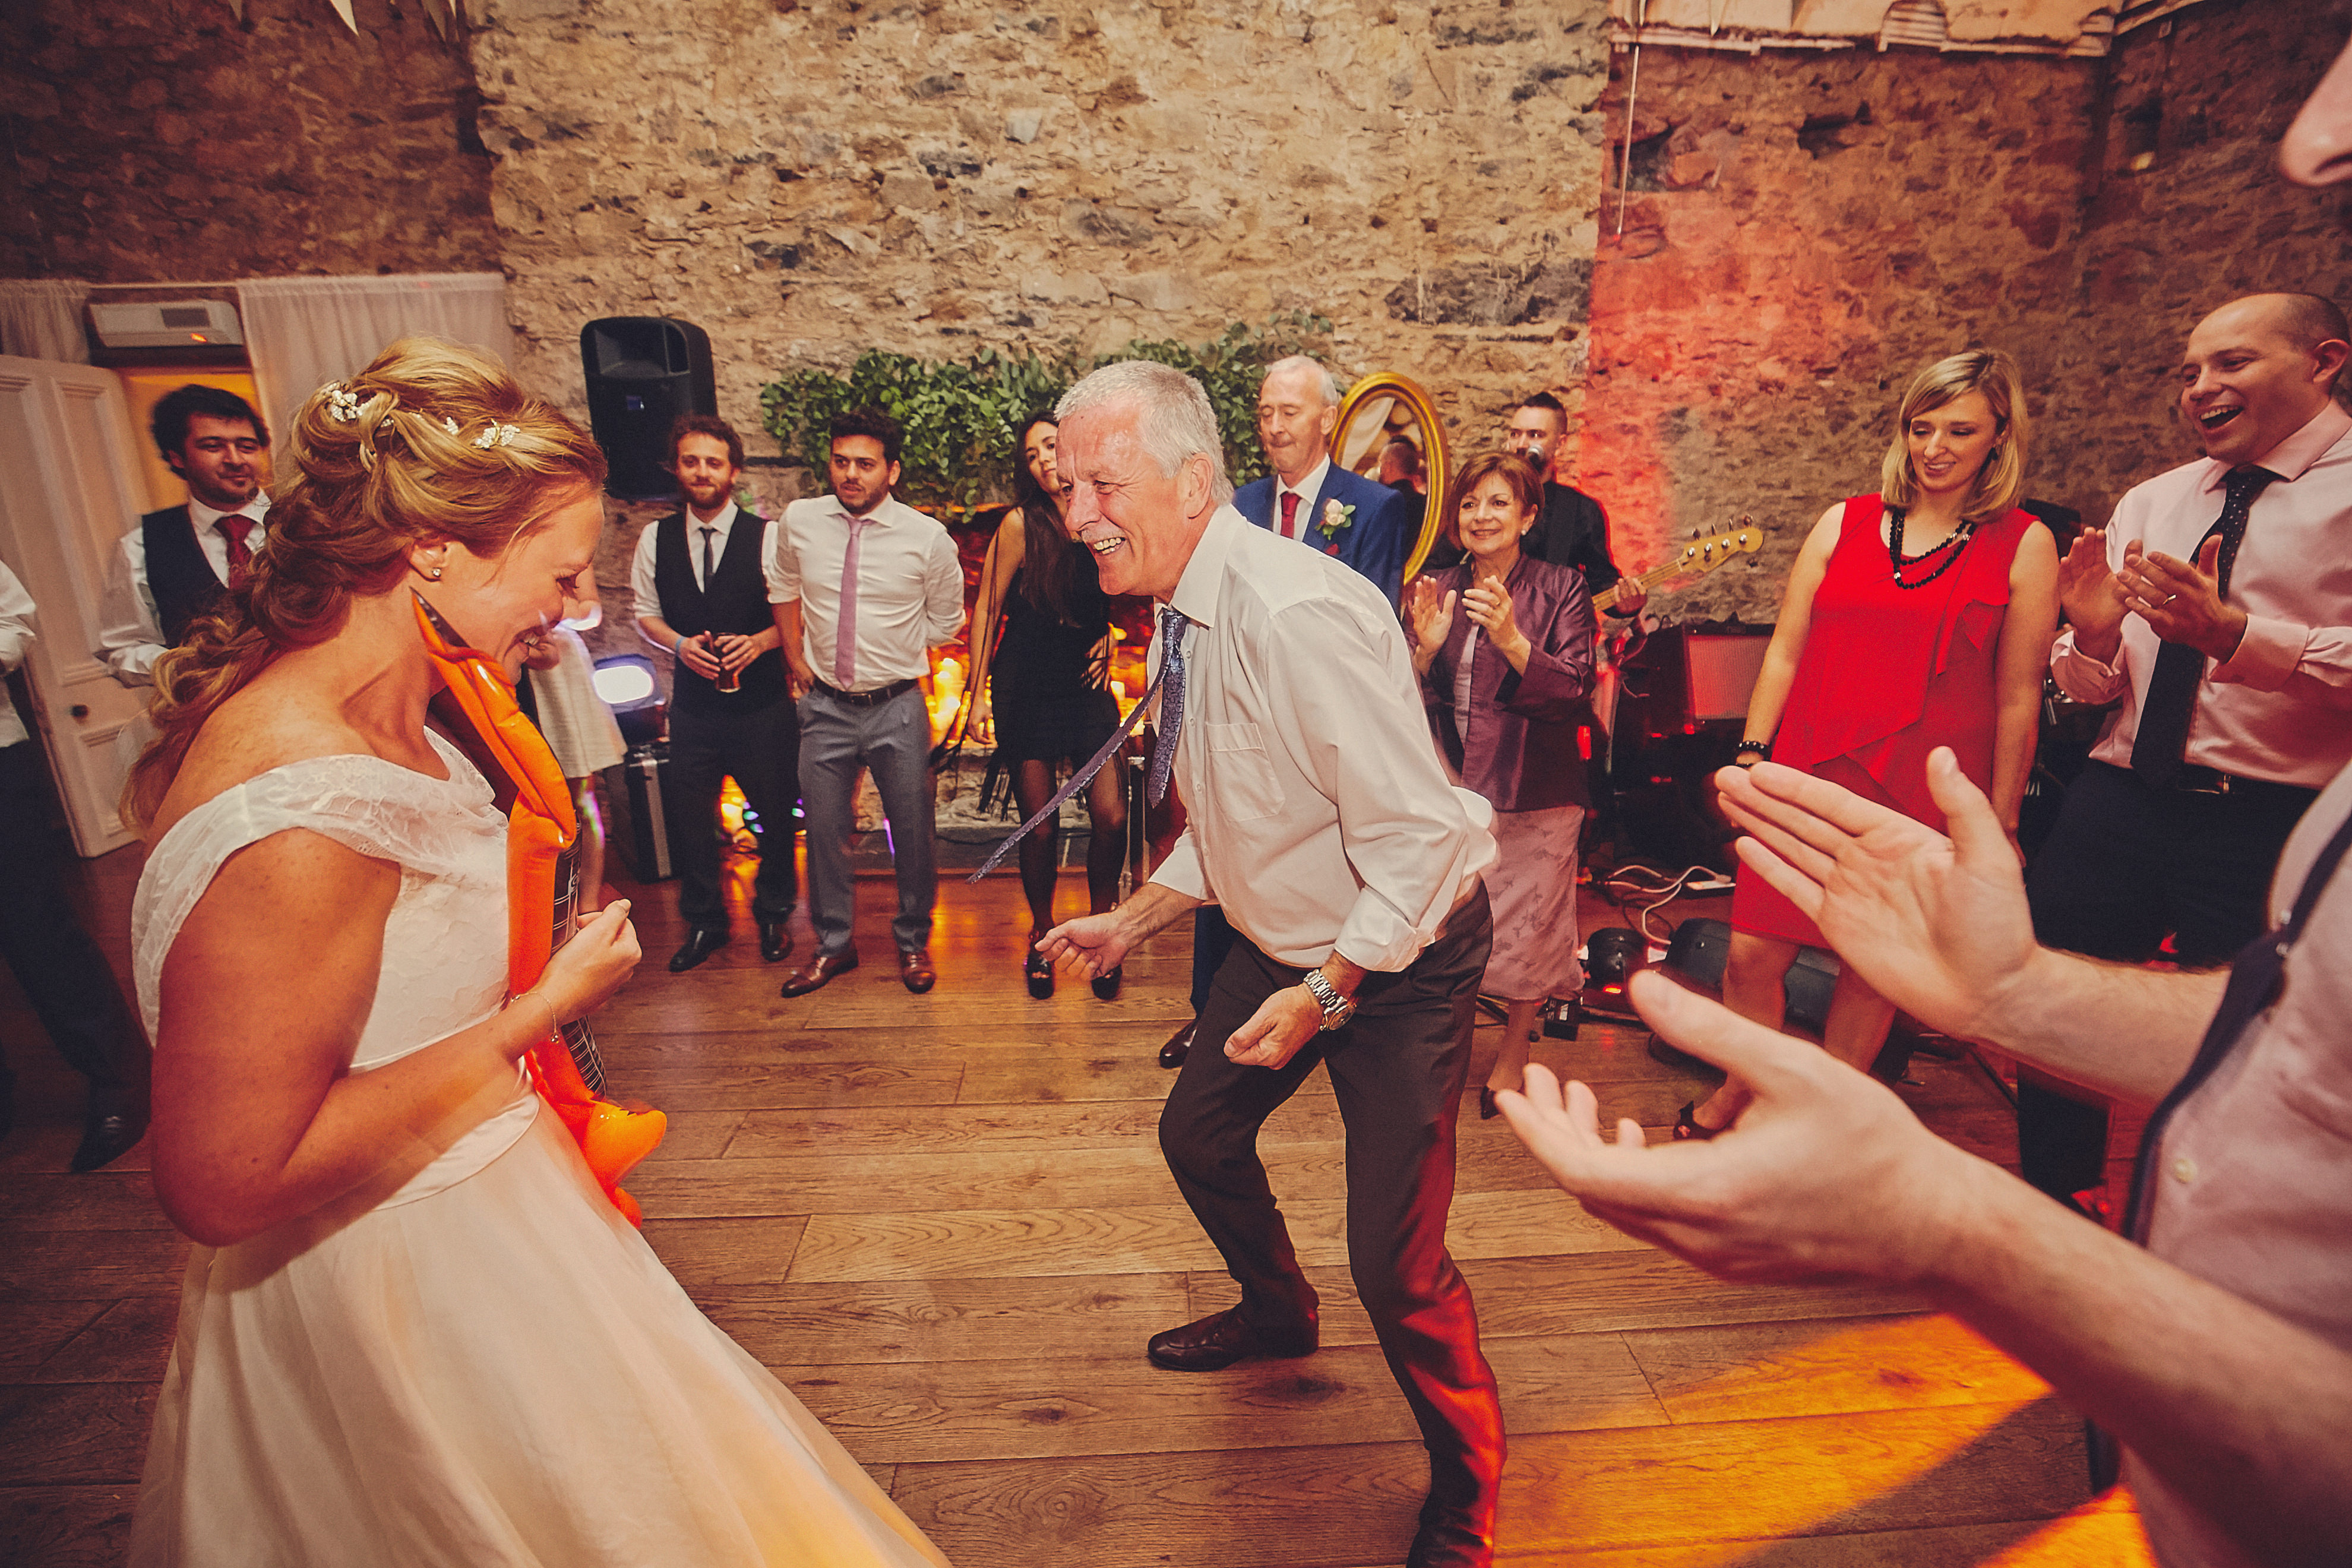 Cloughjordan House weddding161 - Cloughjordan House Wedding - Alternative Venue